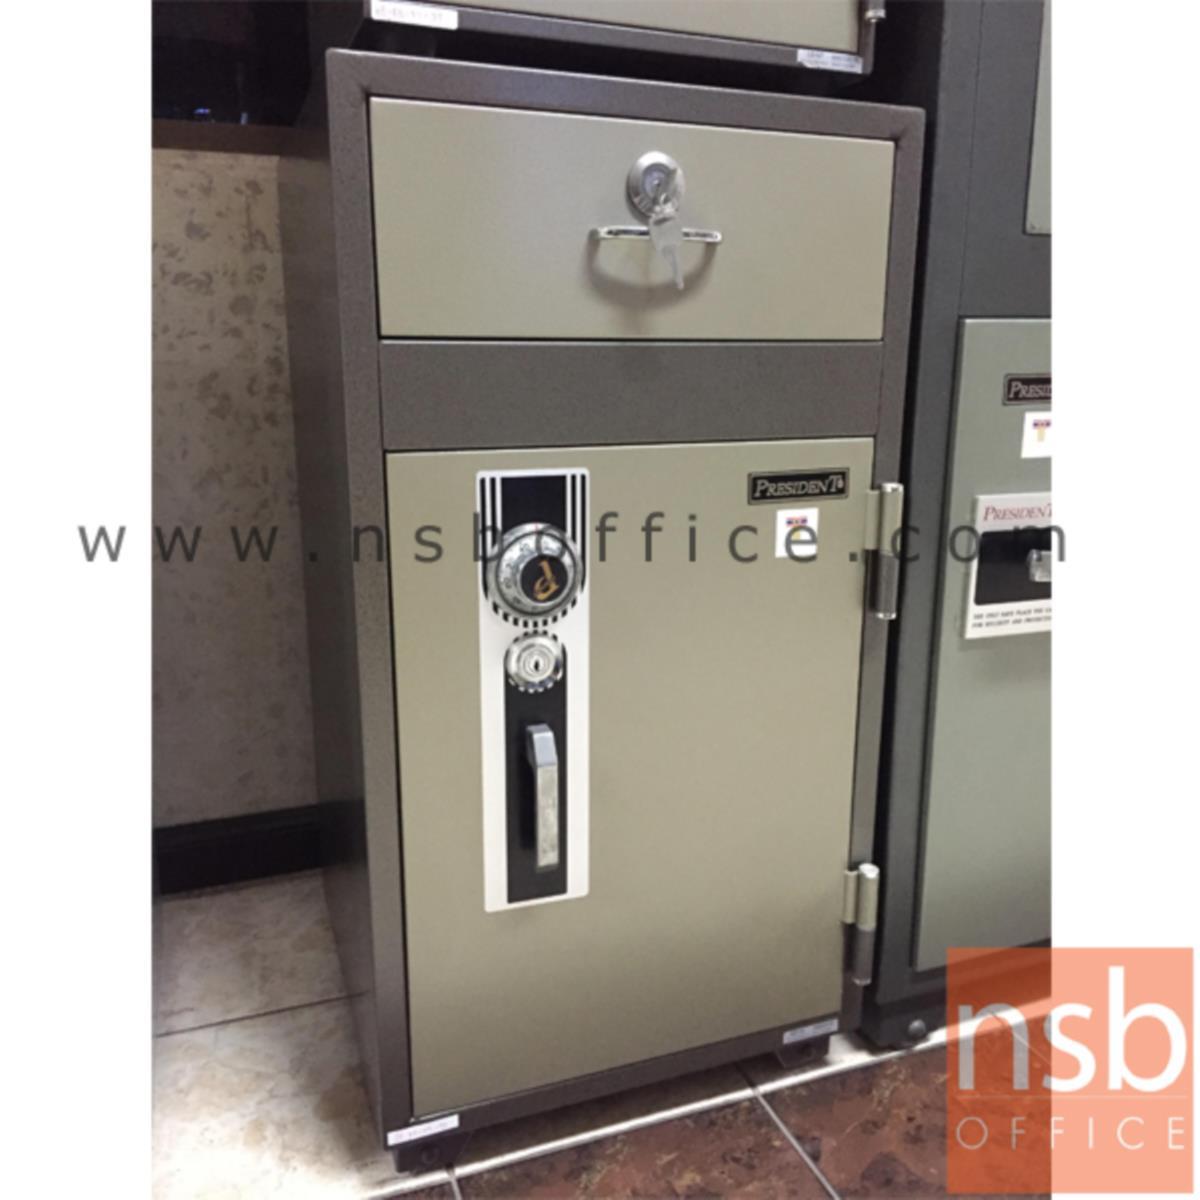 F05A004:ตู้เซฟแคชเชียร์ 130 กก. รุ่น PRESIDENT-ND100  มี 1 กุญแจ 1 รหัส พร้อมลิ้นชักแยก (เปลี่ยนรหัสไม่ได้)